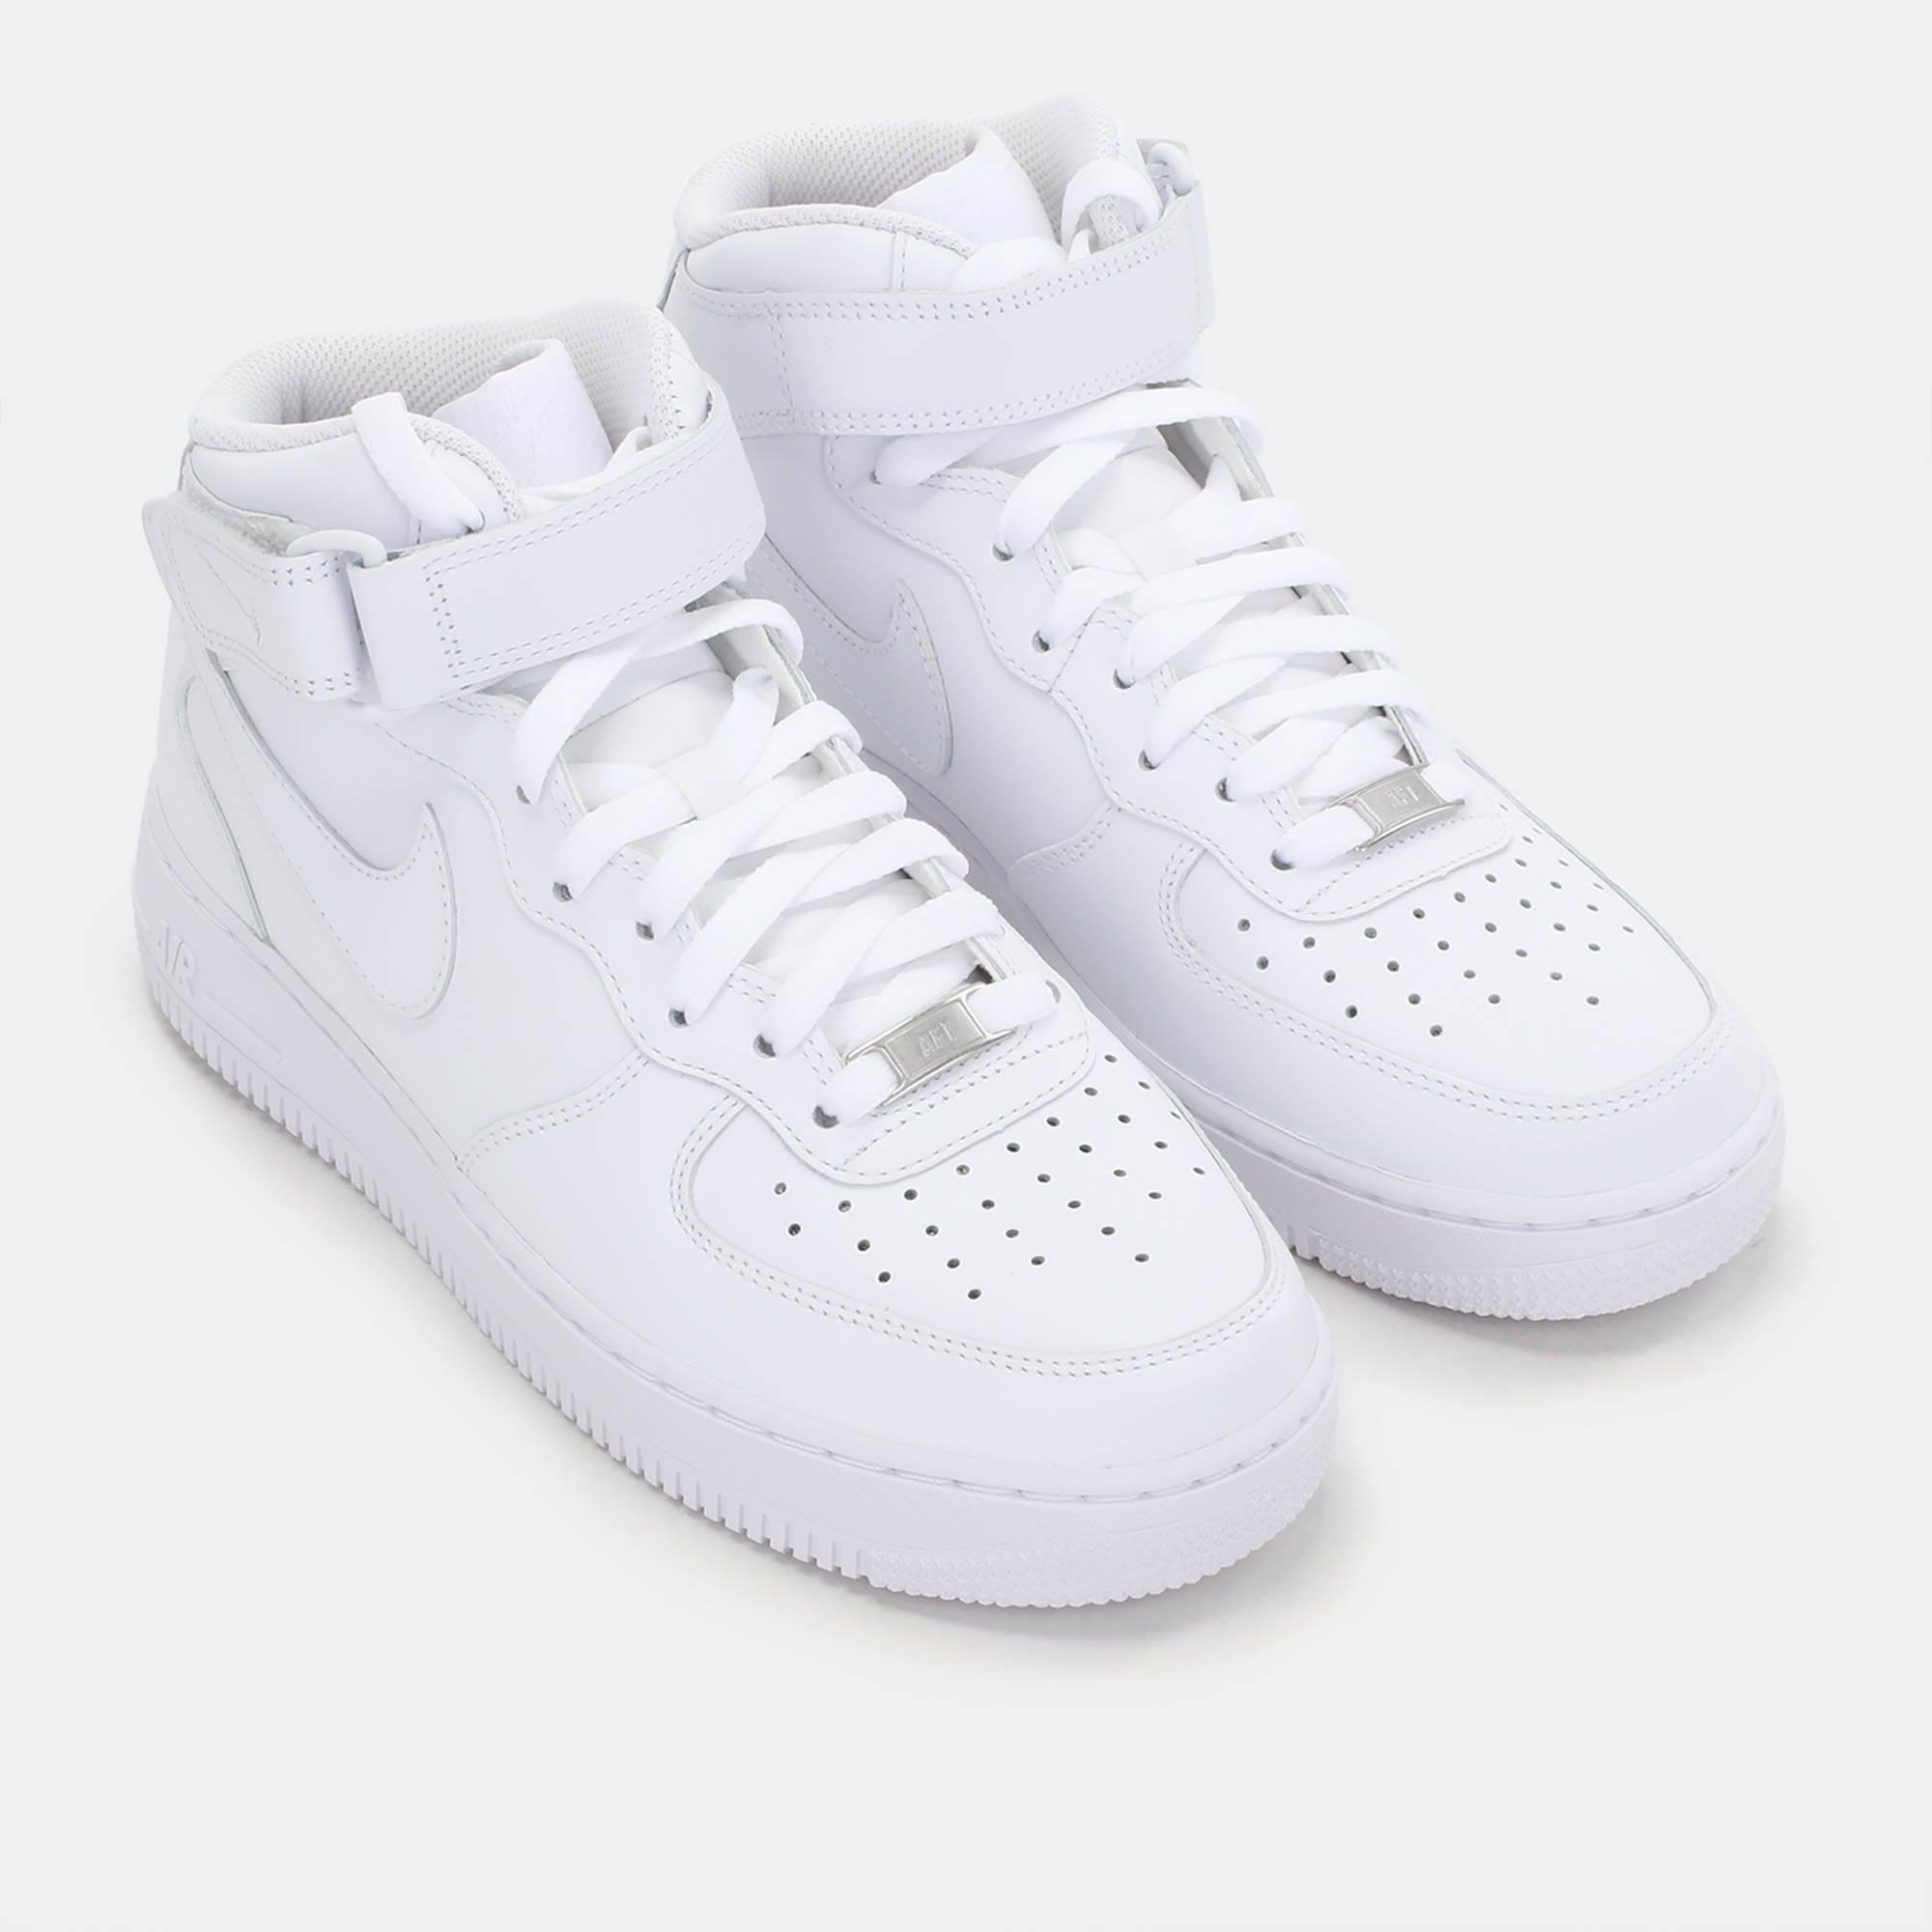 2000x2000 Shop White Nike Air Force 1 Mid